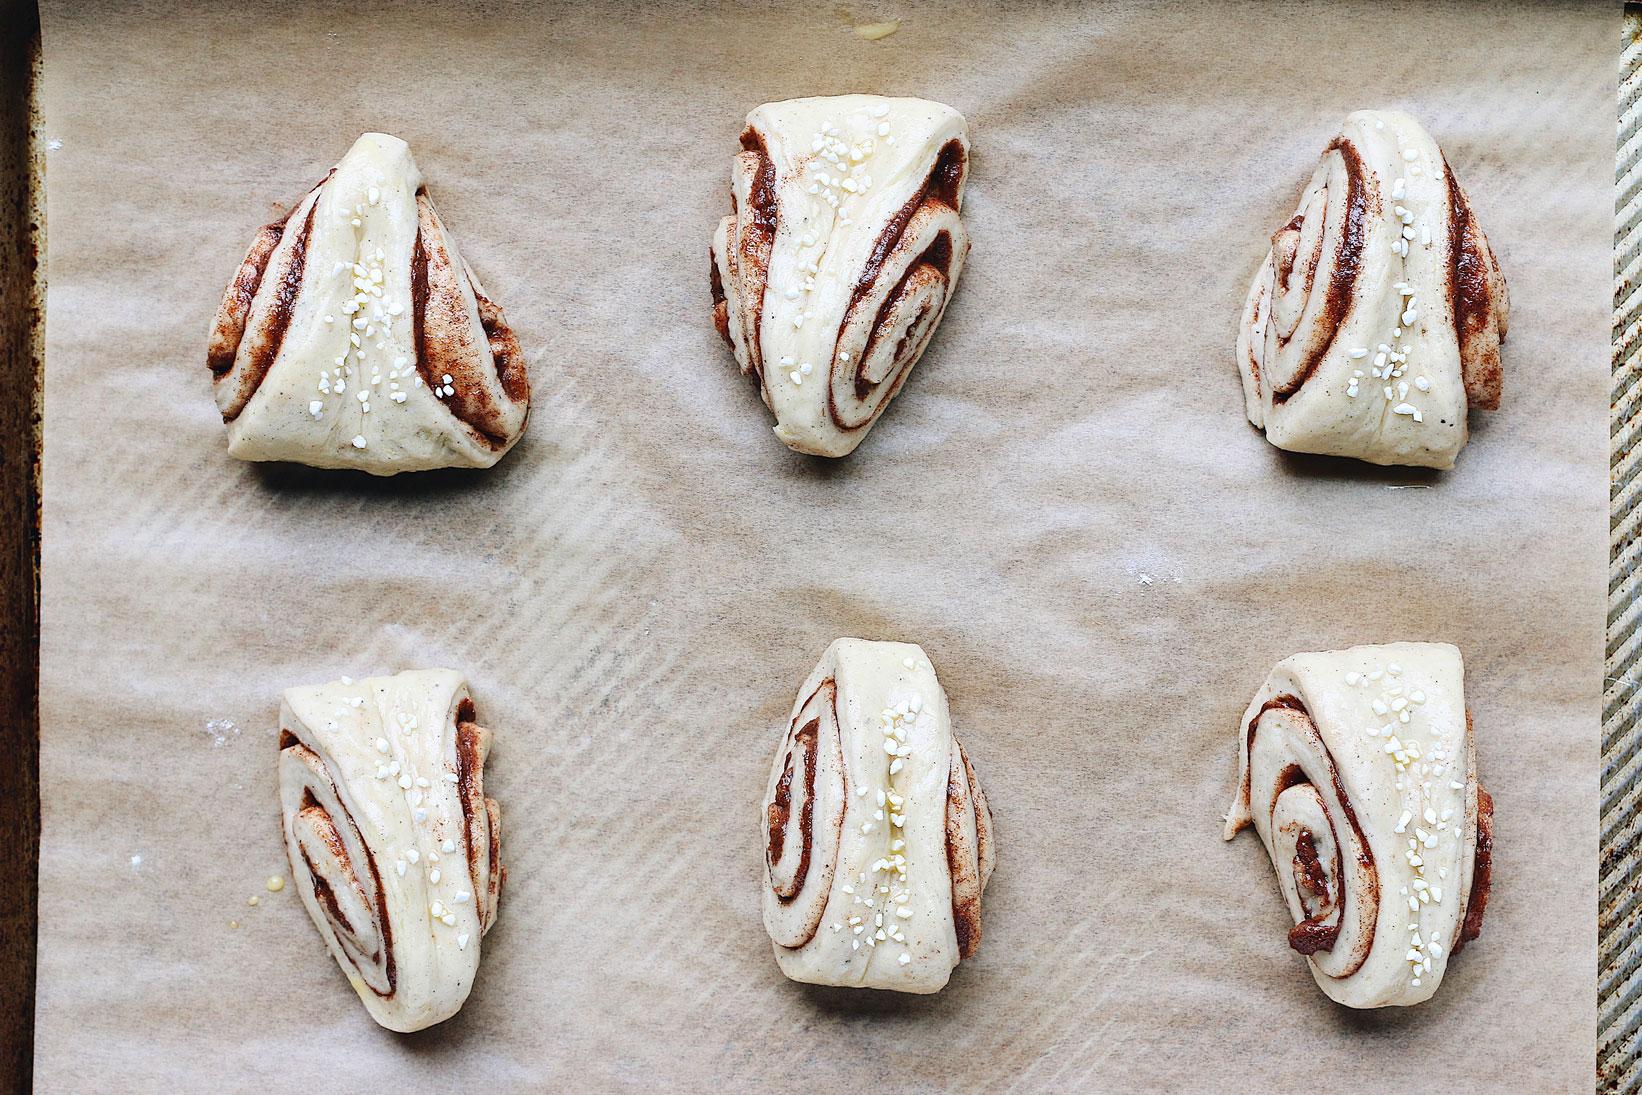 korvapuusti-finnish-cinnamon-cardamon-sweet-roll-before-bake